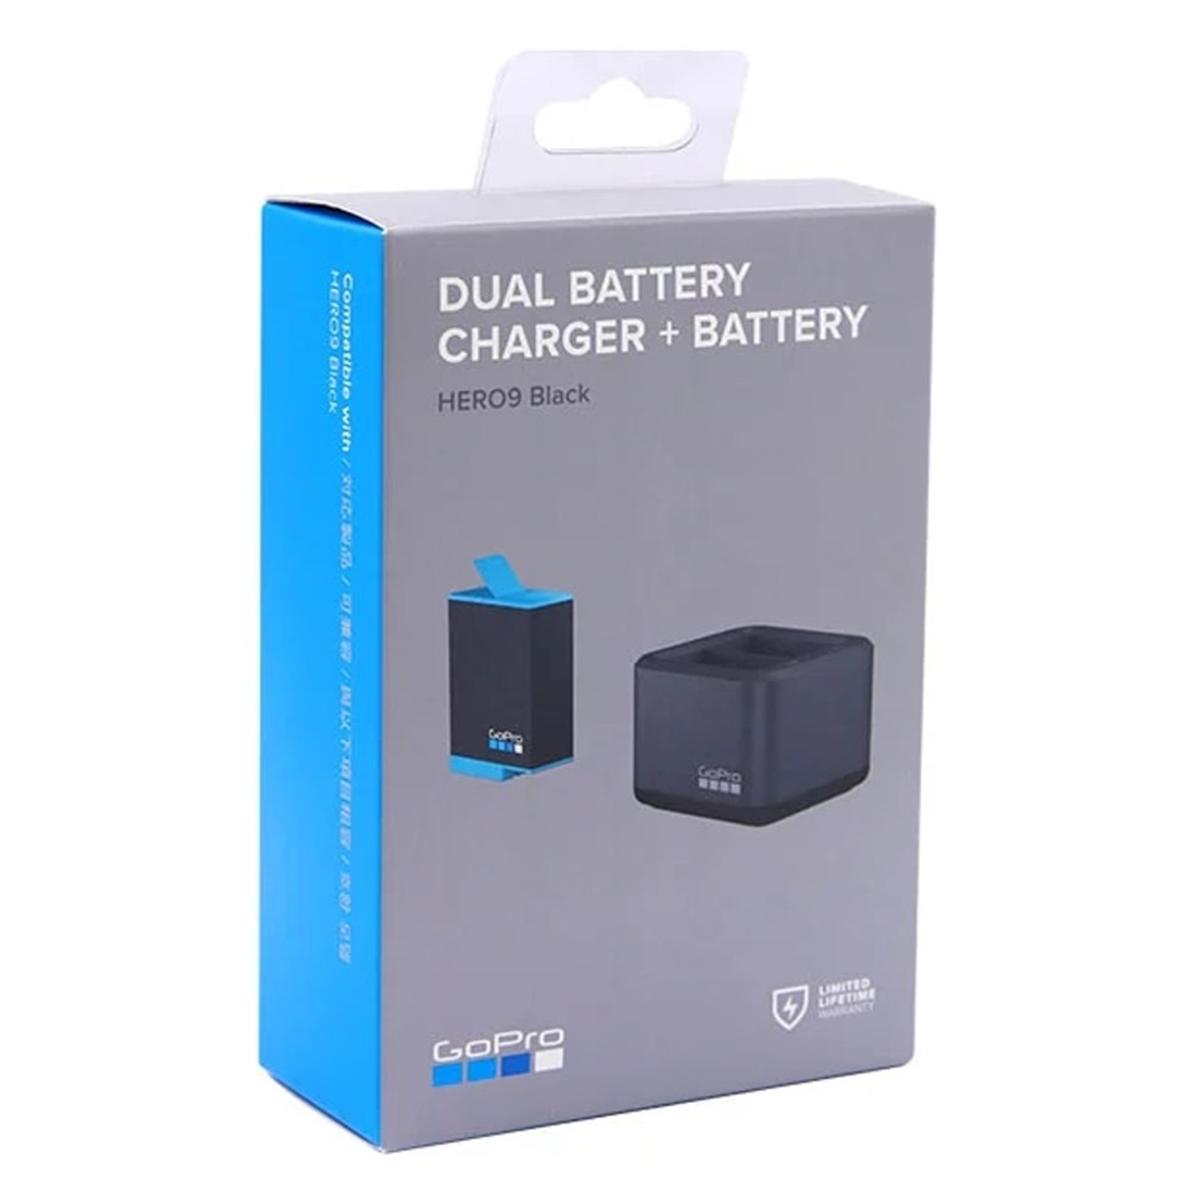 Bateria e Carregador Duplo - GoPro Hero9 Black - ADDBD-001